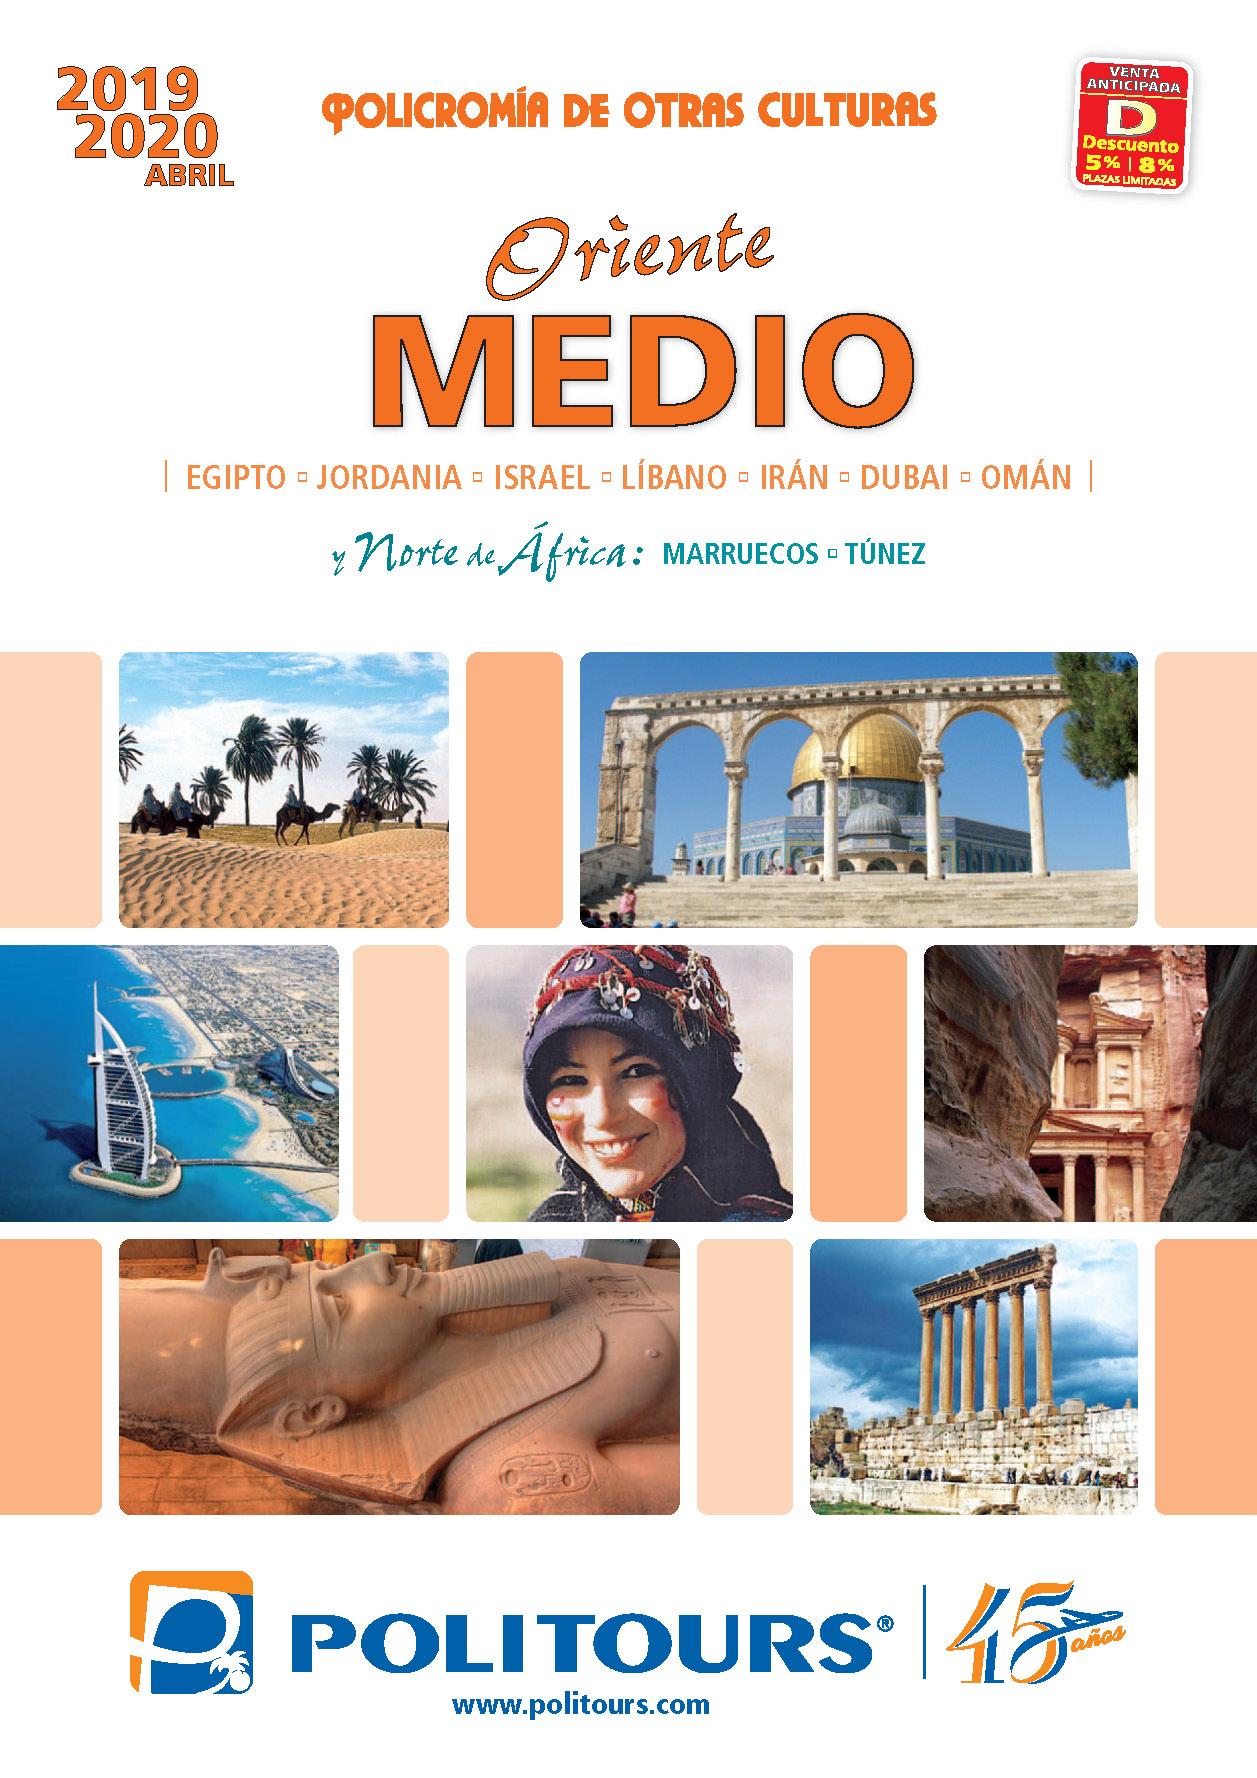 Catalogo Politours Oriente Medio 2019-2020